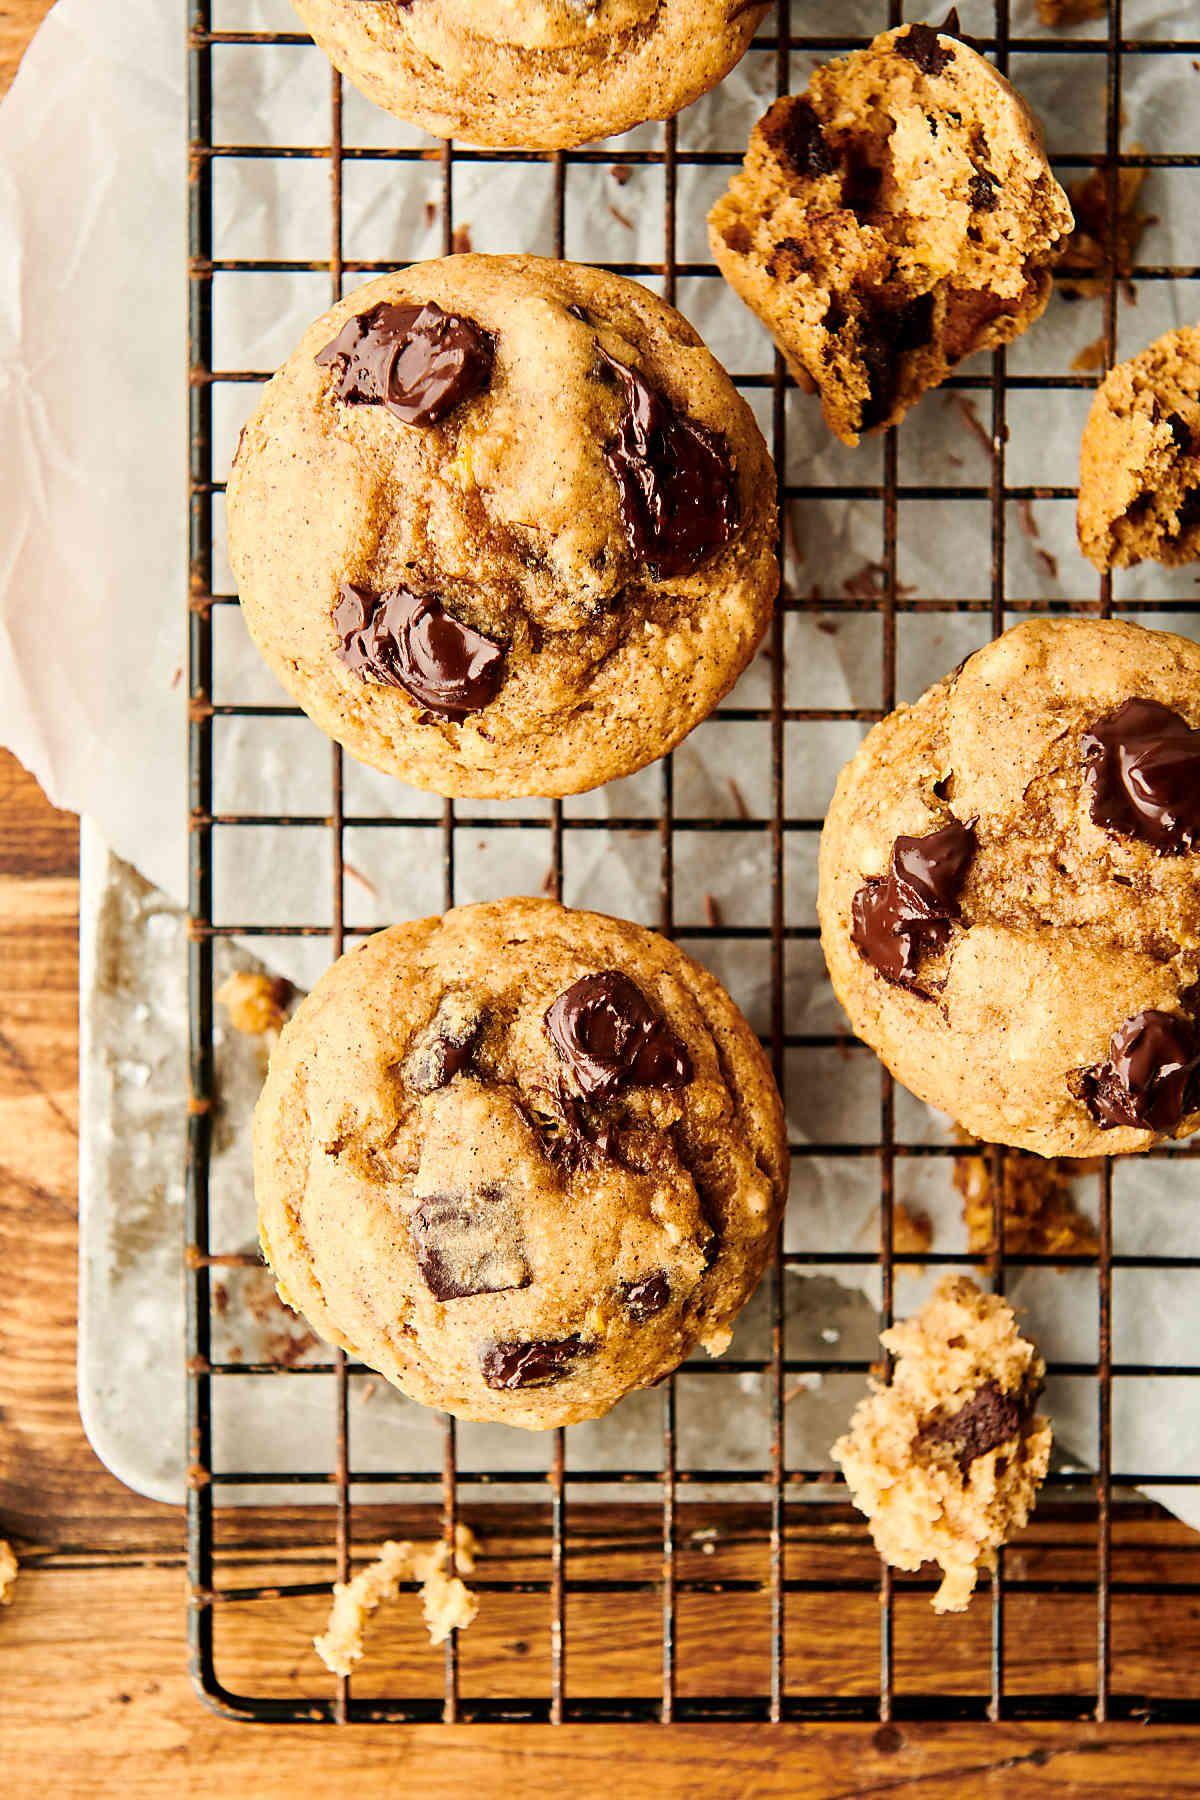 Healthy Banana Pancake Muffins Recipes W Chocolate Chips Recipe In 2020 Banana Pancakes Healthy Banana Healthy Banana Pancakes